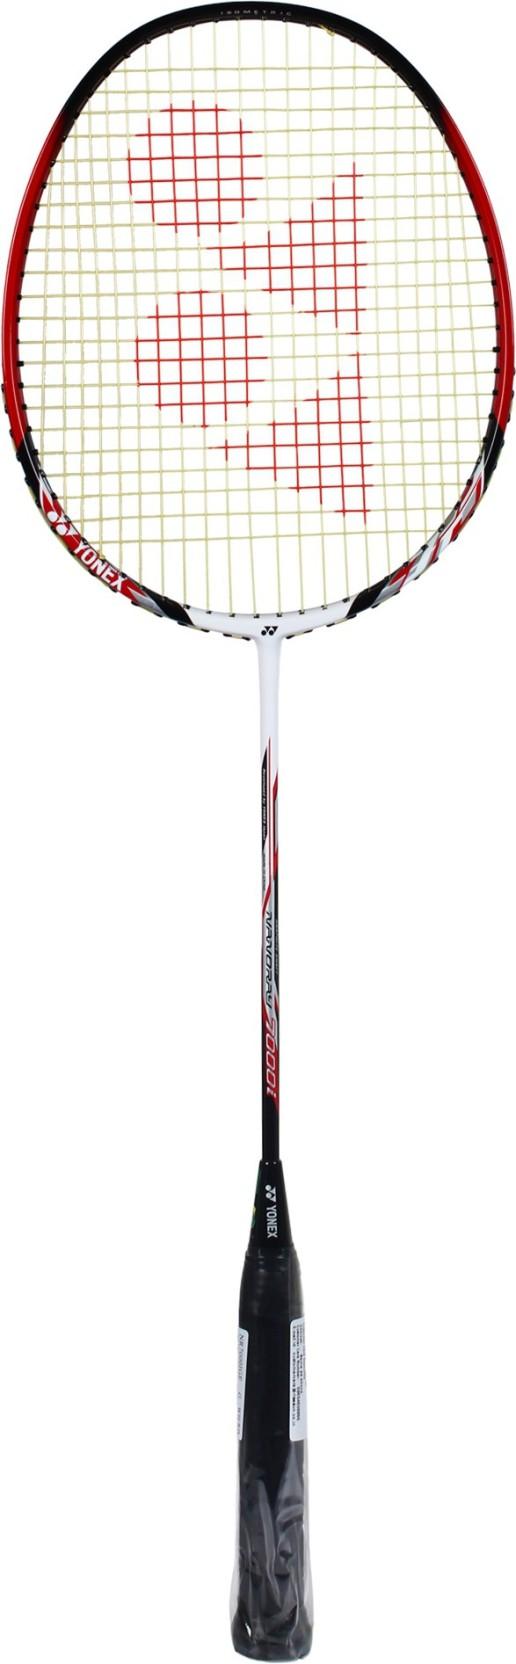 Yonex Nanoray 7000i Multicolor Strung Badminton Racquet Buy Grip Lining Gp 34a Original Add To Cart